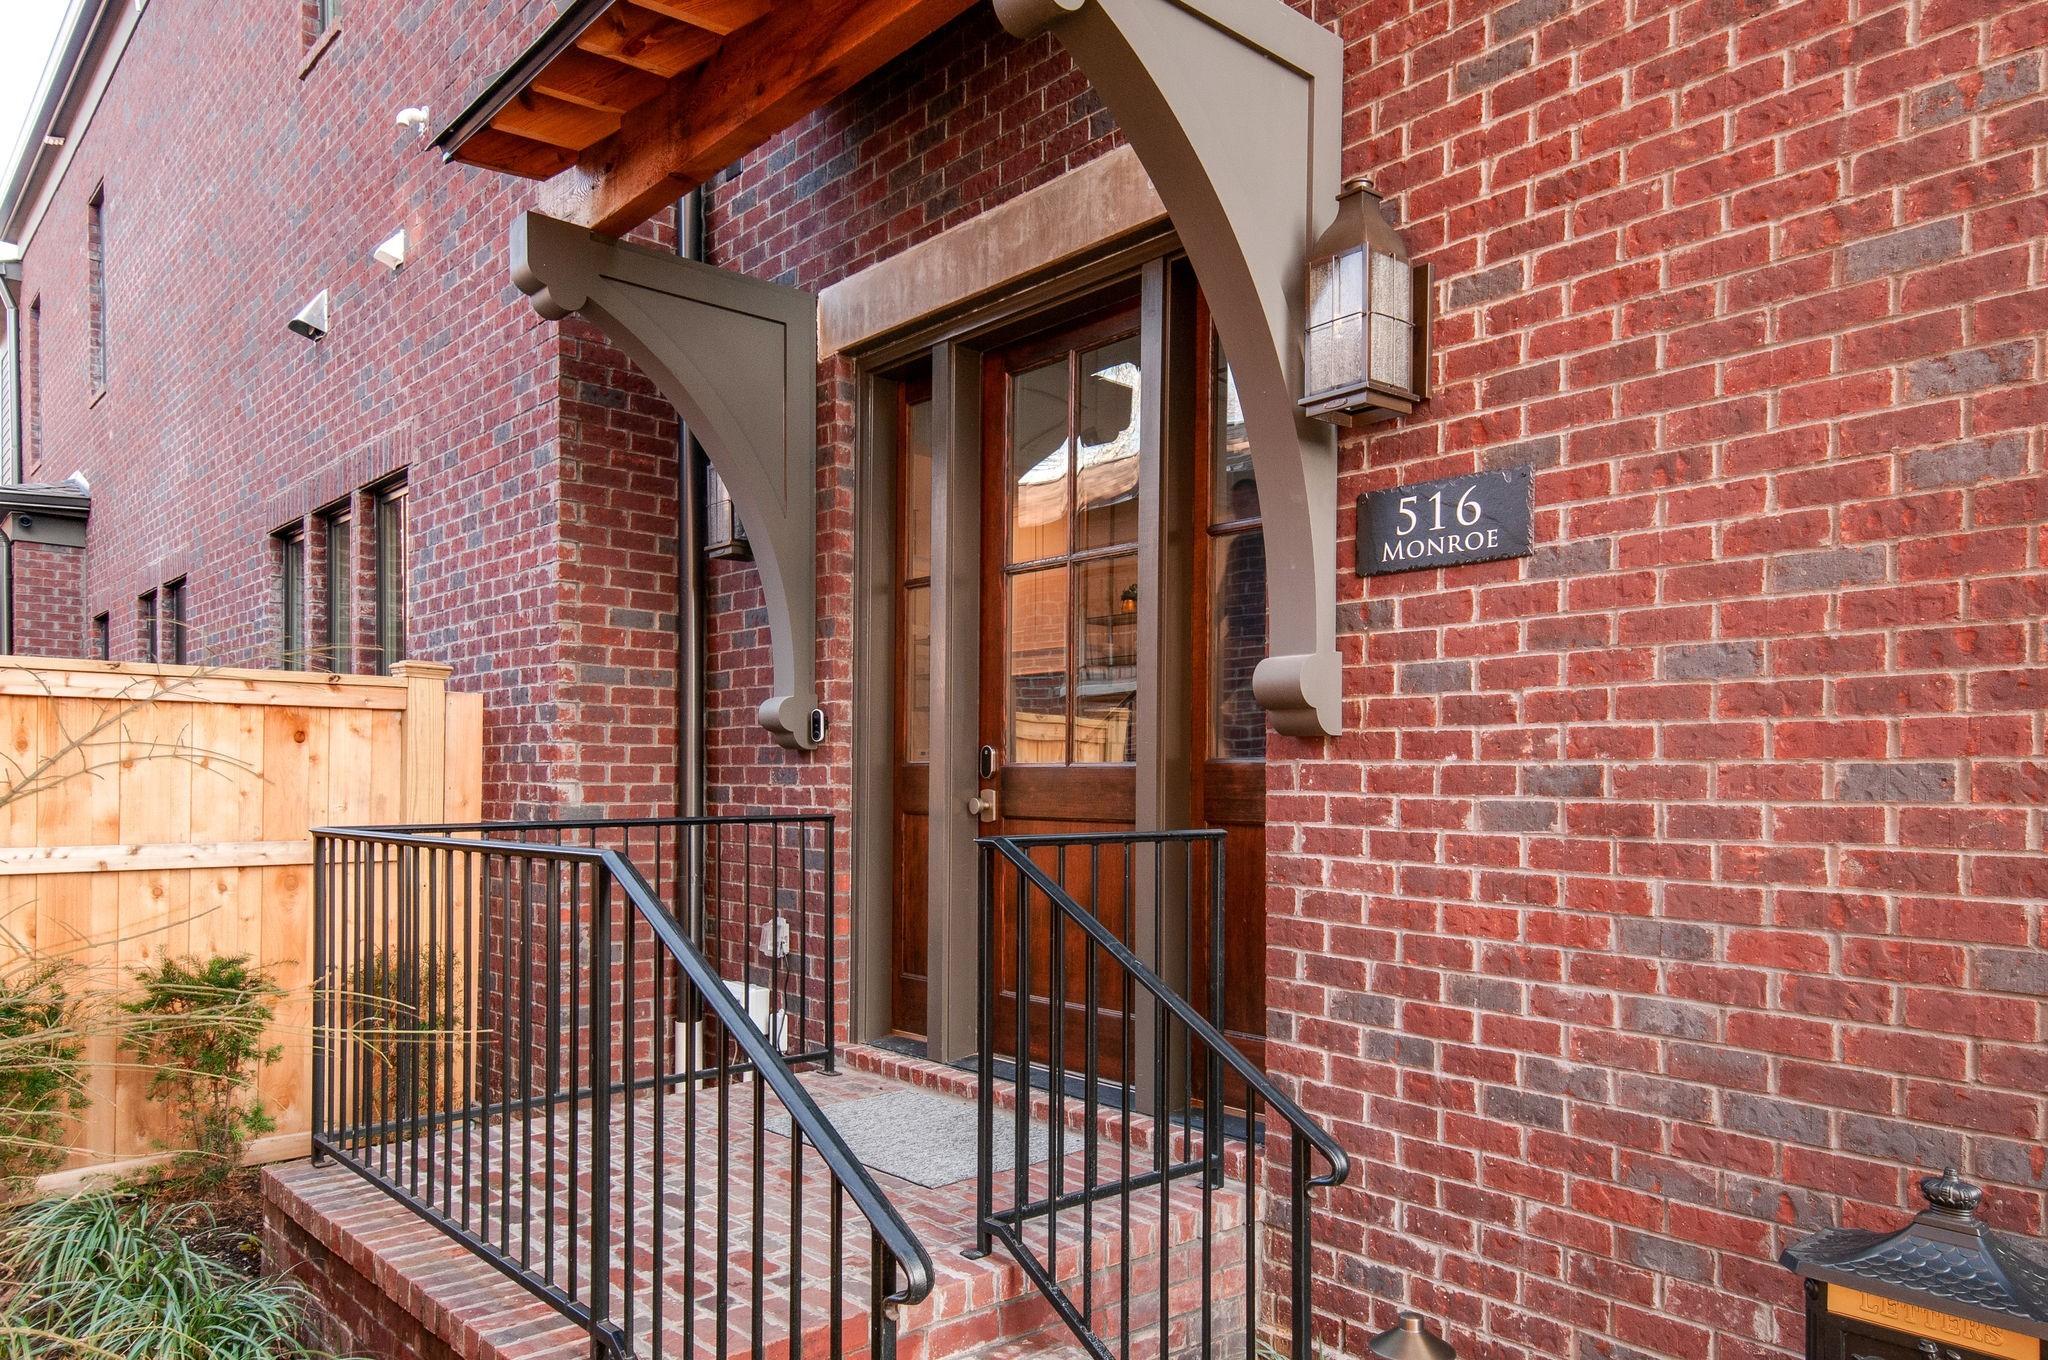 516 Monroe St, Nashville, TN 37208 - Nashville, TN real estate listing